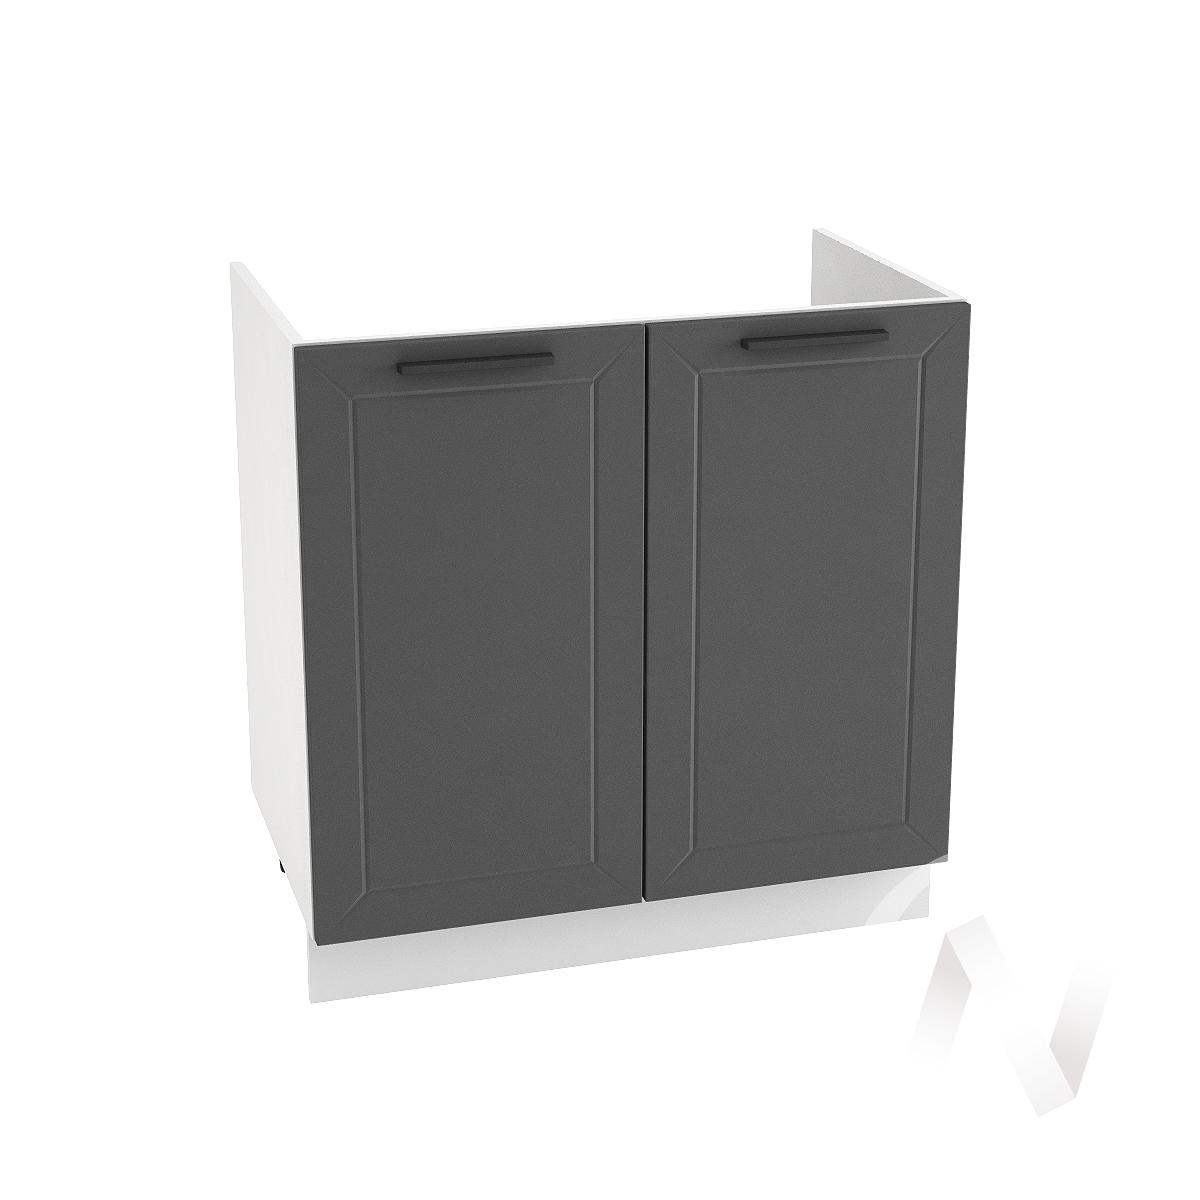 "Кухня ""Глетчер"": Шкаф нижний под мойку 800, ШНМ 800 (Маренго силк/корпус белый)"